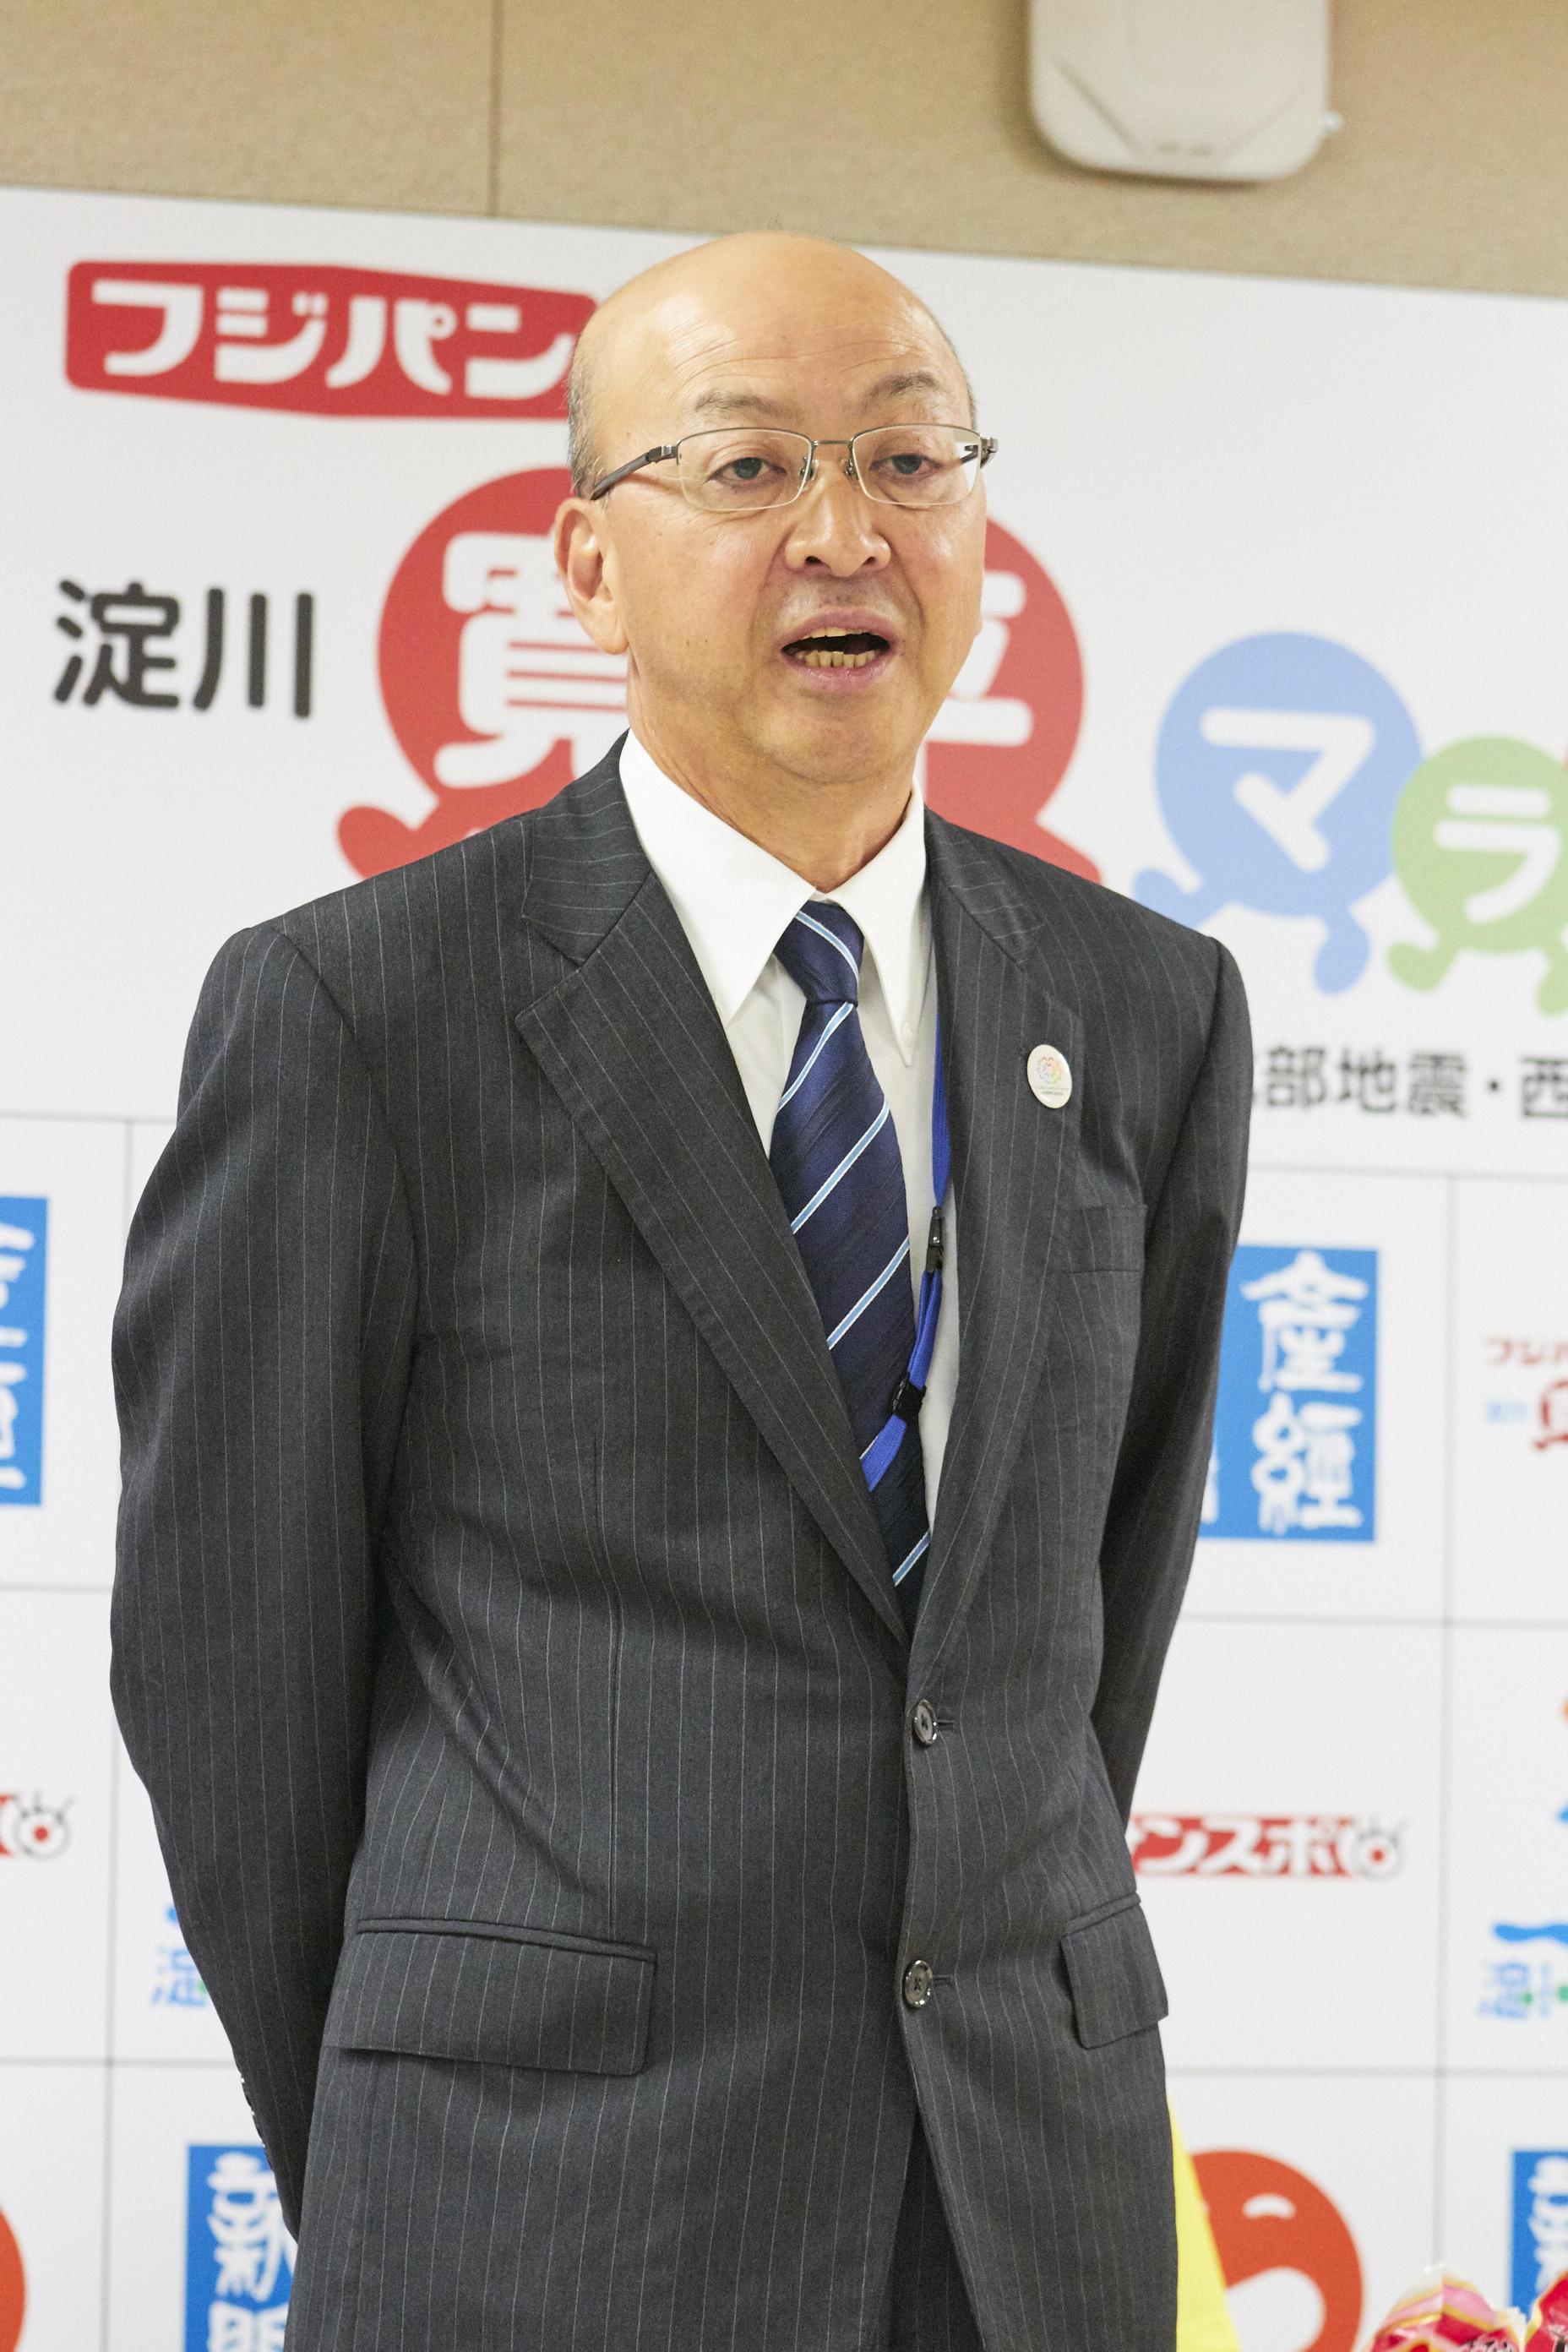 http://news.yoshimoto.co.jp/20180830001032-6e7318ba8e0886147aae3ef52268b2514305bf84.jpg